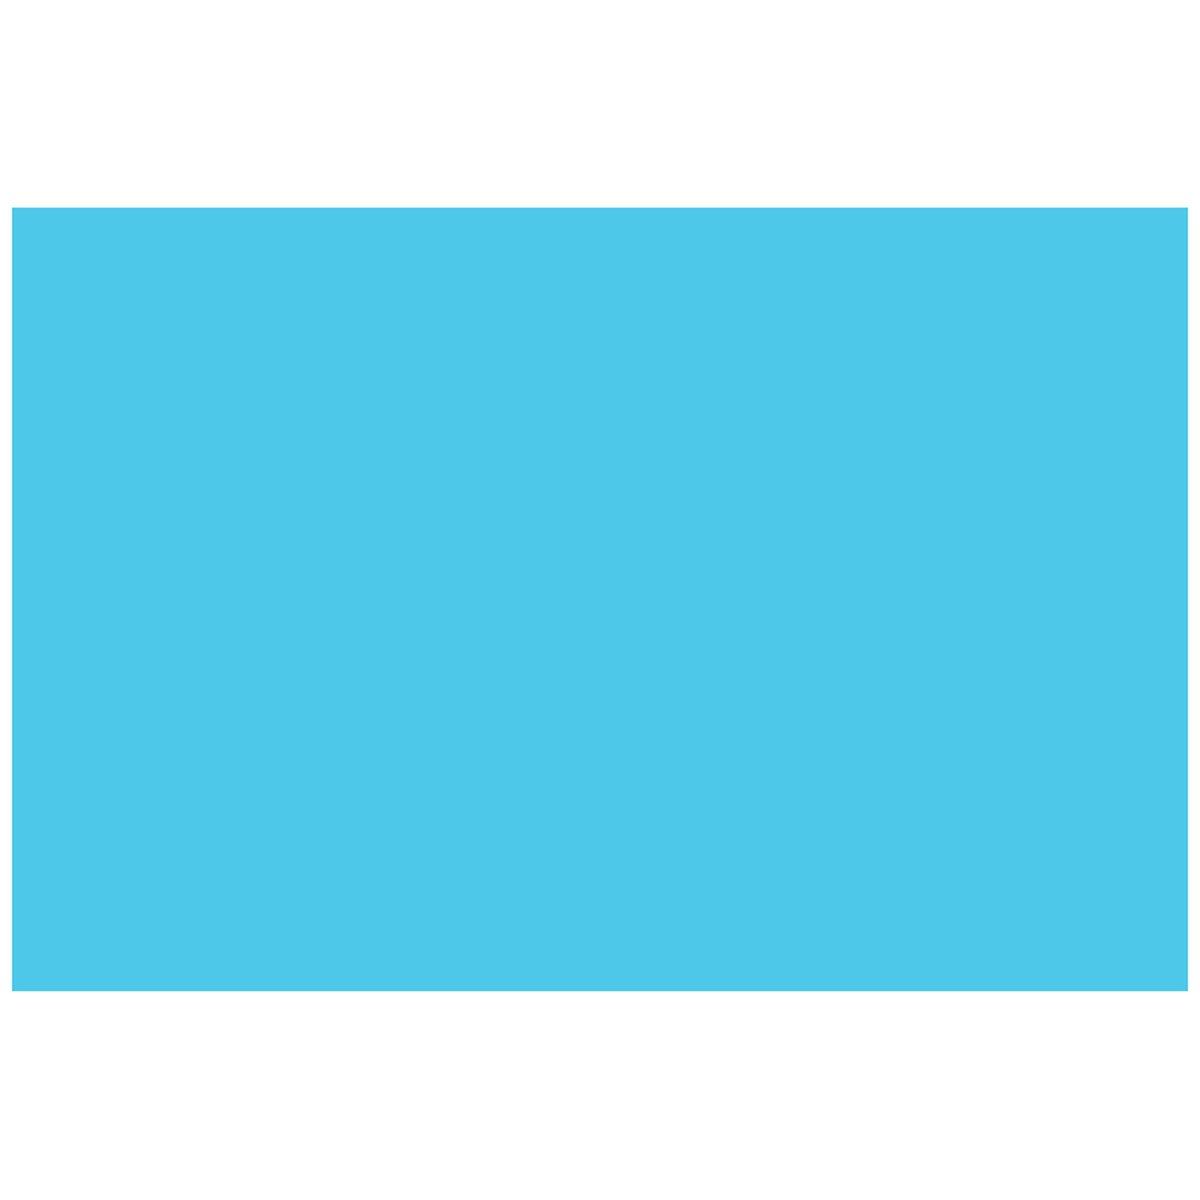 PDC Healthcare CS-BL Label Compatible with CS-2 Guns Paper, Permanent, 1'' Core, 15/16'' x 5/8'', Blue (Pack of 24000)